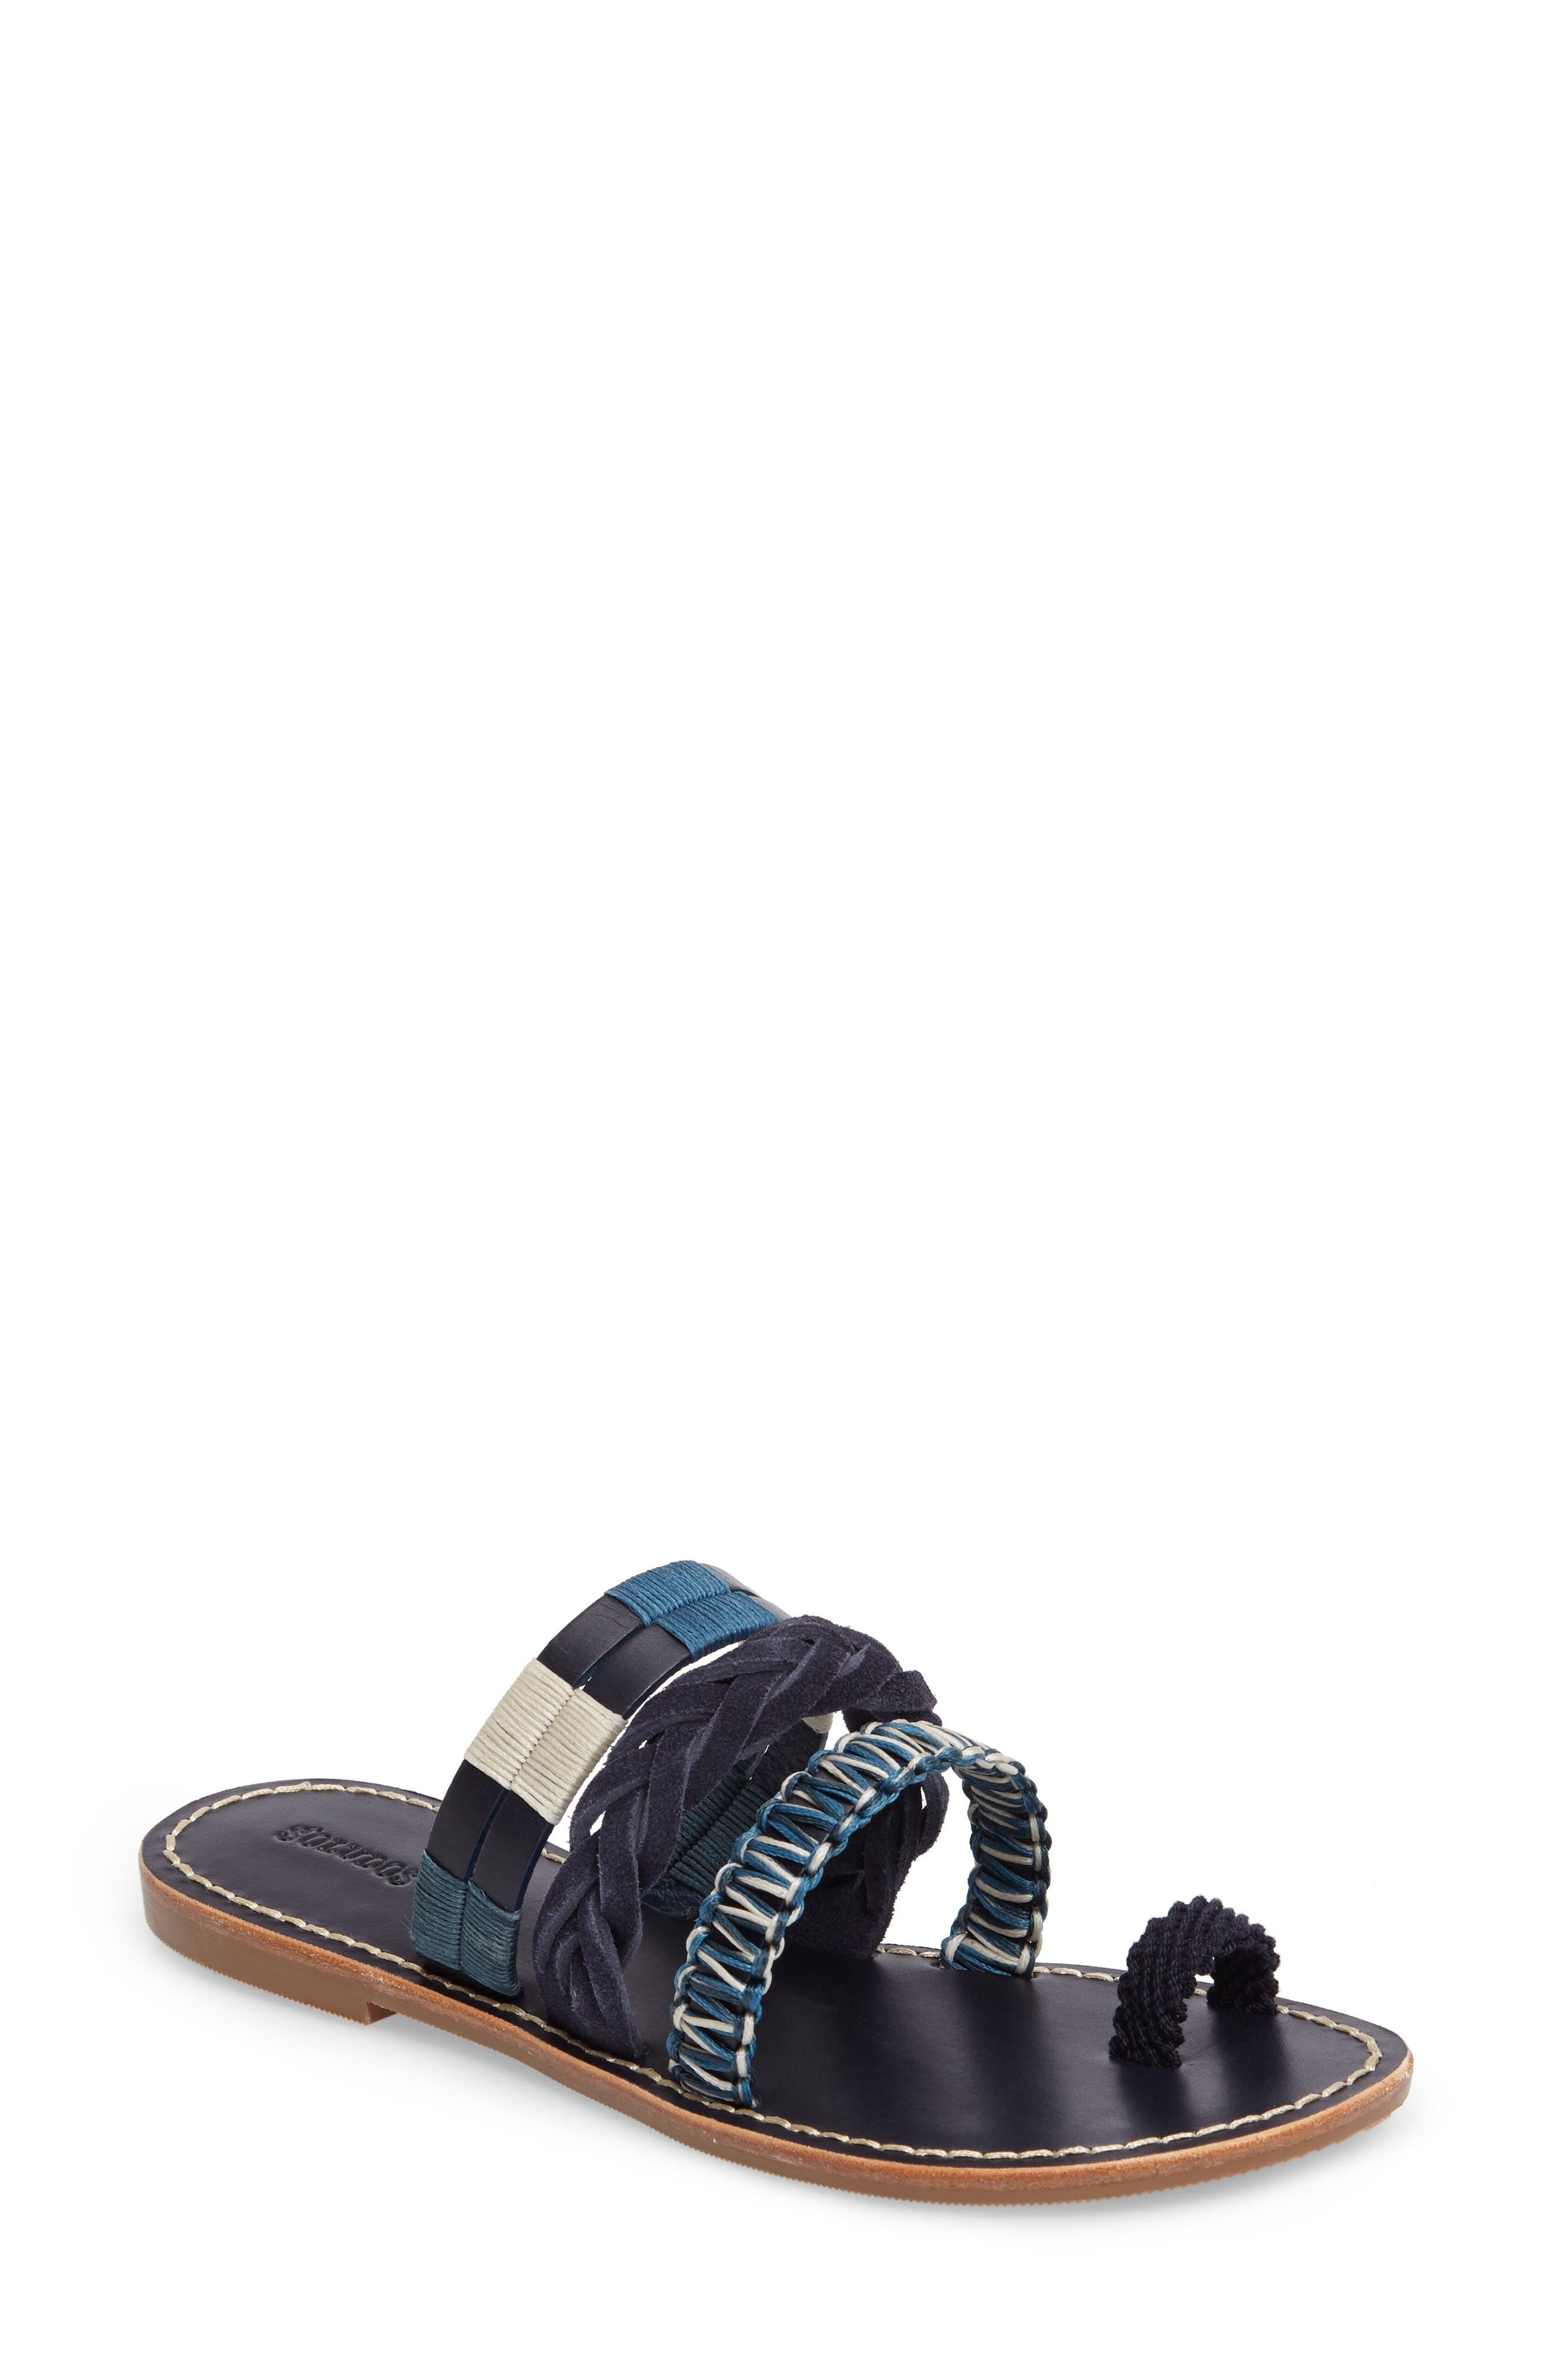 Slide Sandal,                             Main thumbnail 1, color,                             Midnight/ Blue Multi Leather